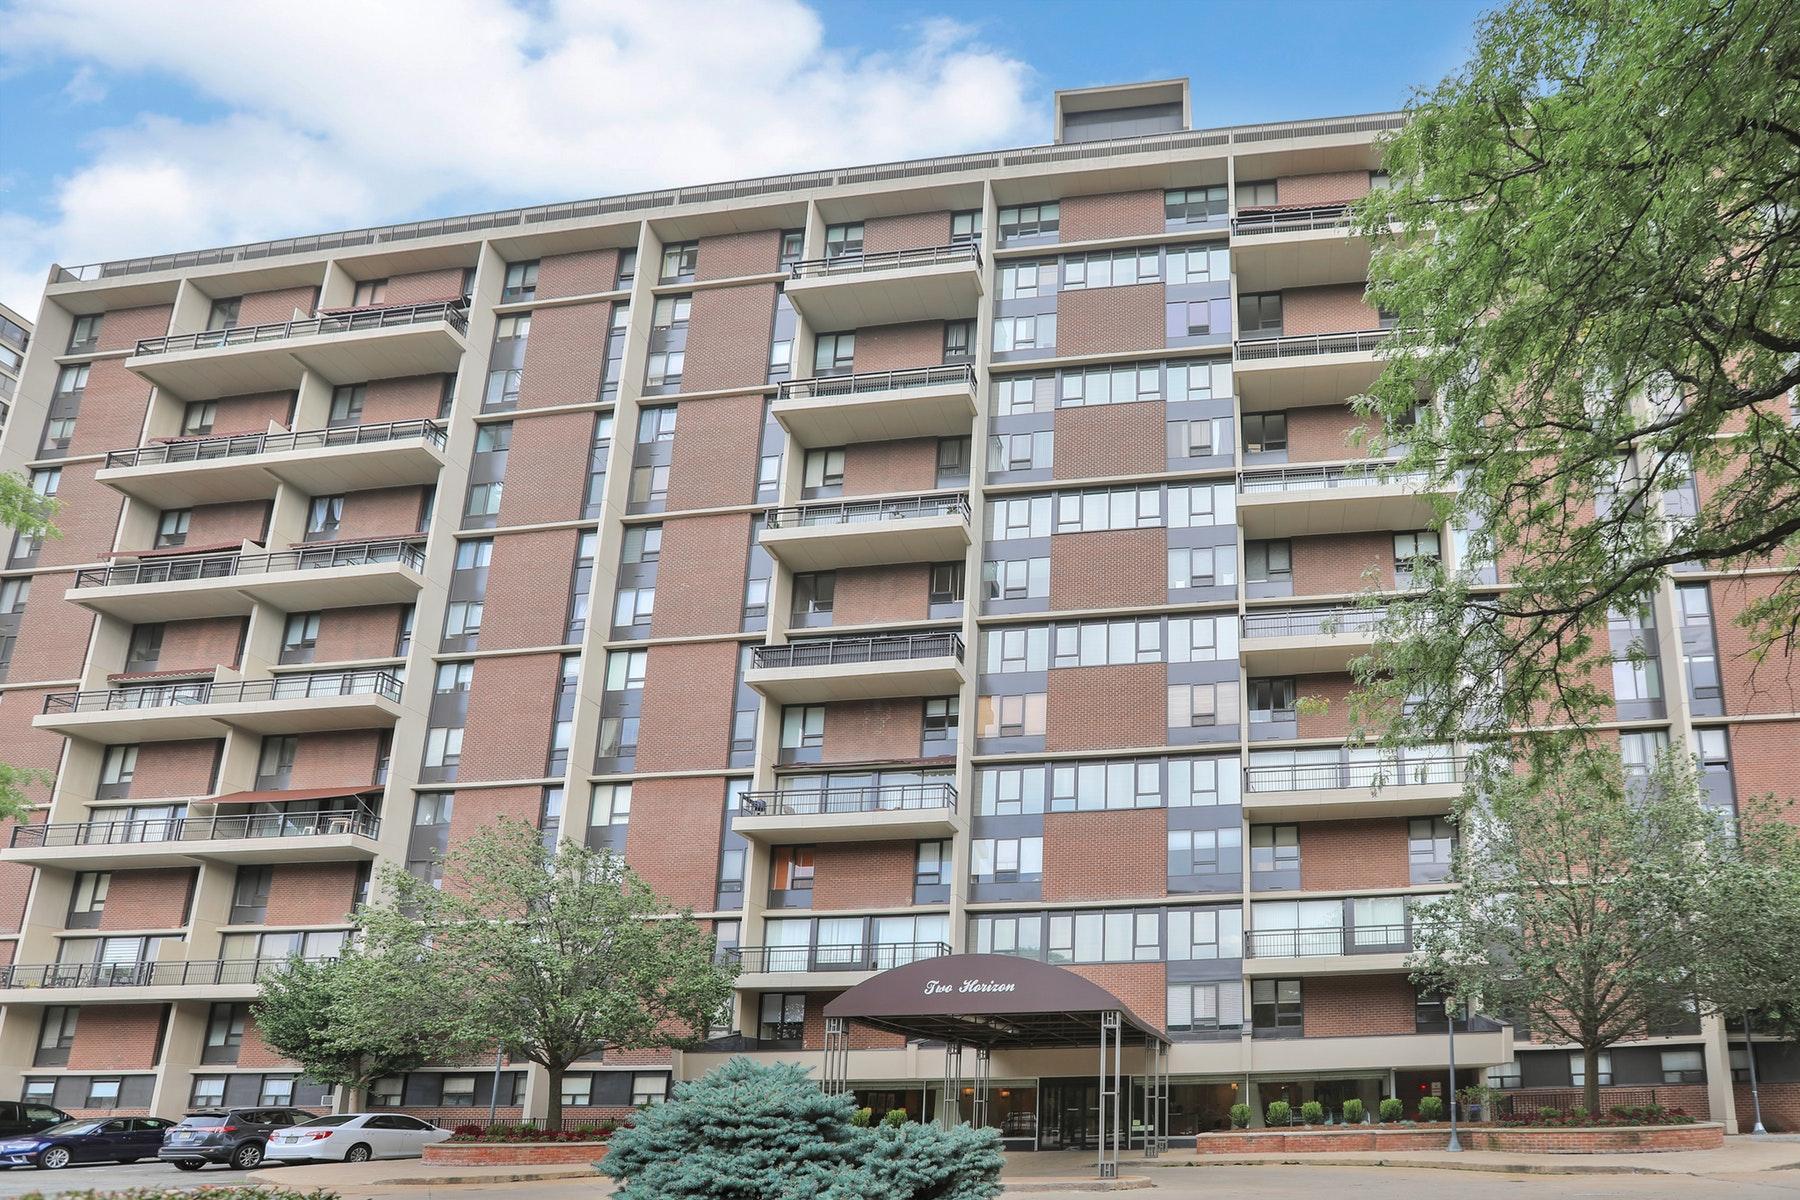 Co-op Properties para Venda às Horizon House 2 Horizon Rd #802, Fort Lee, Nova Jersey 07024 Estados Unidos